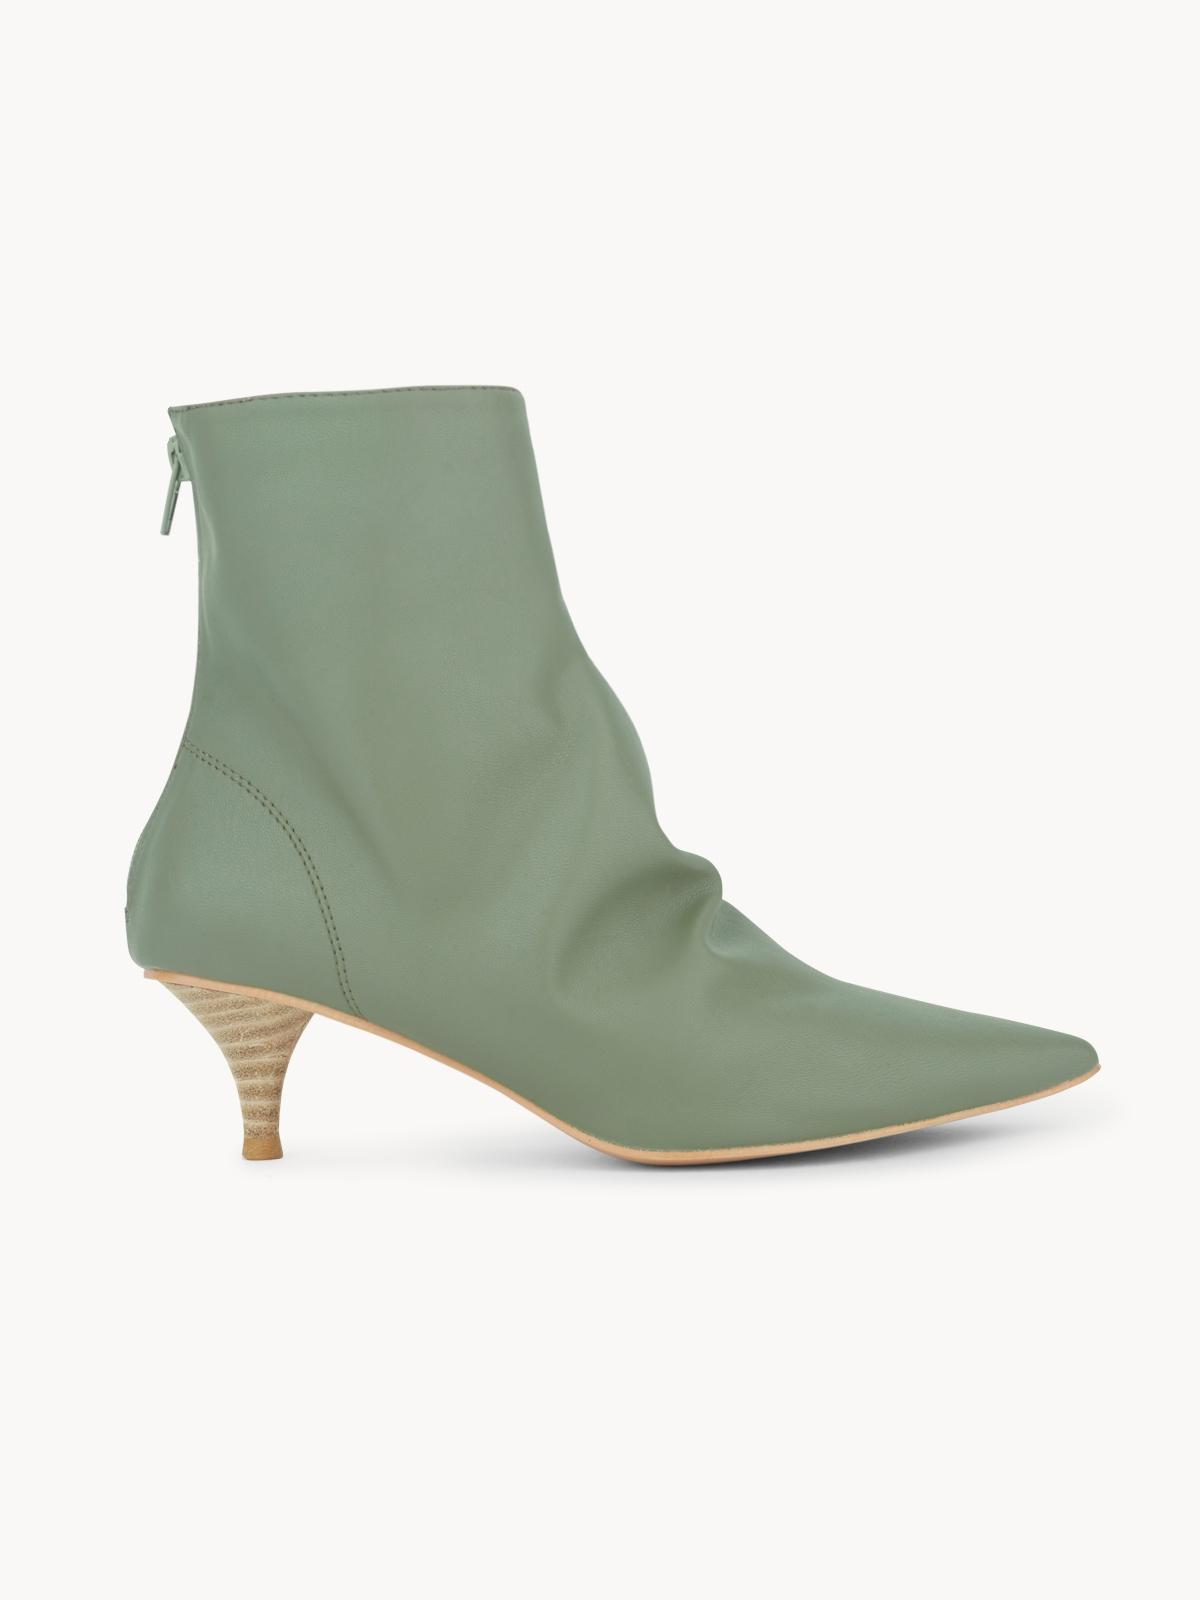 Starkela Western Knee High Boots Green